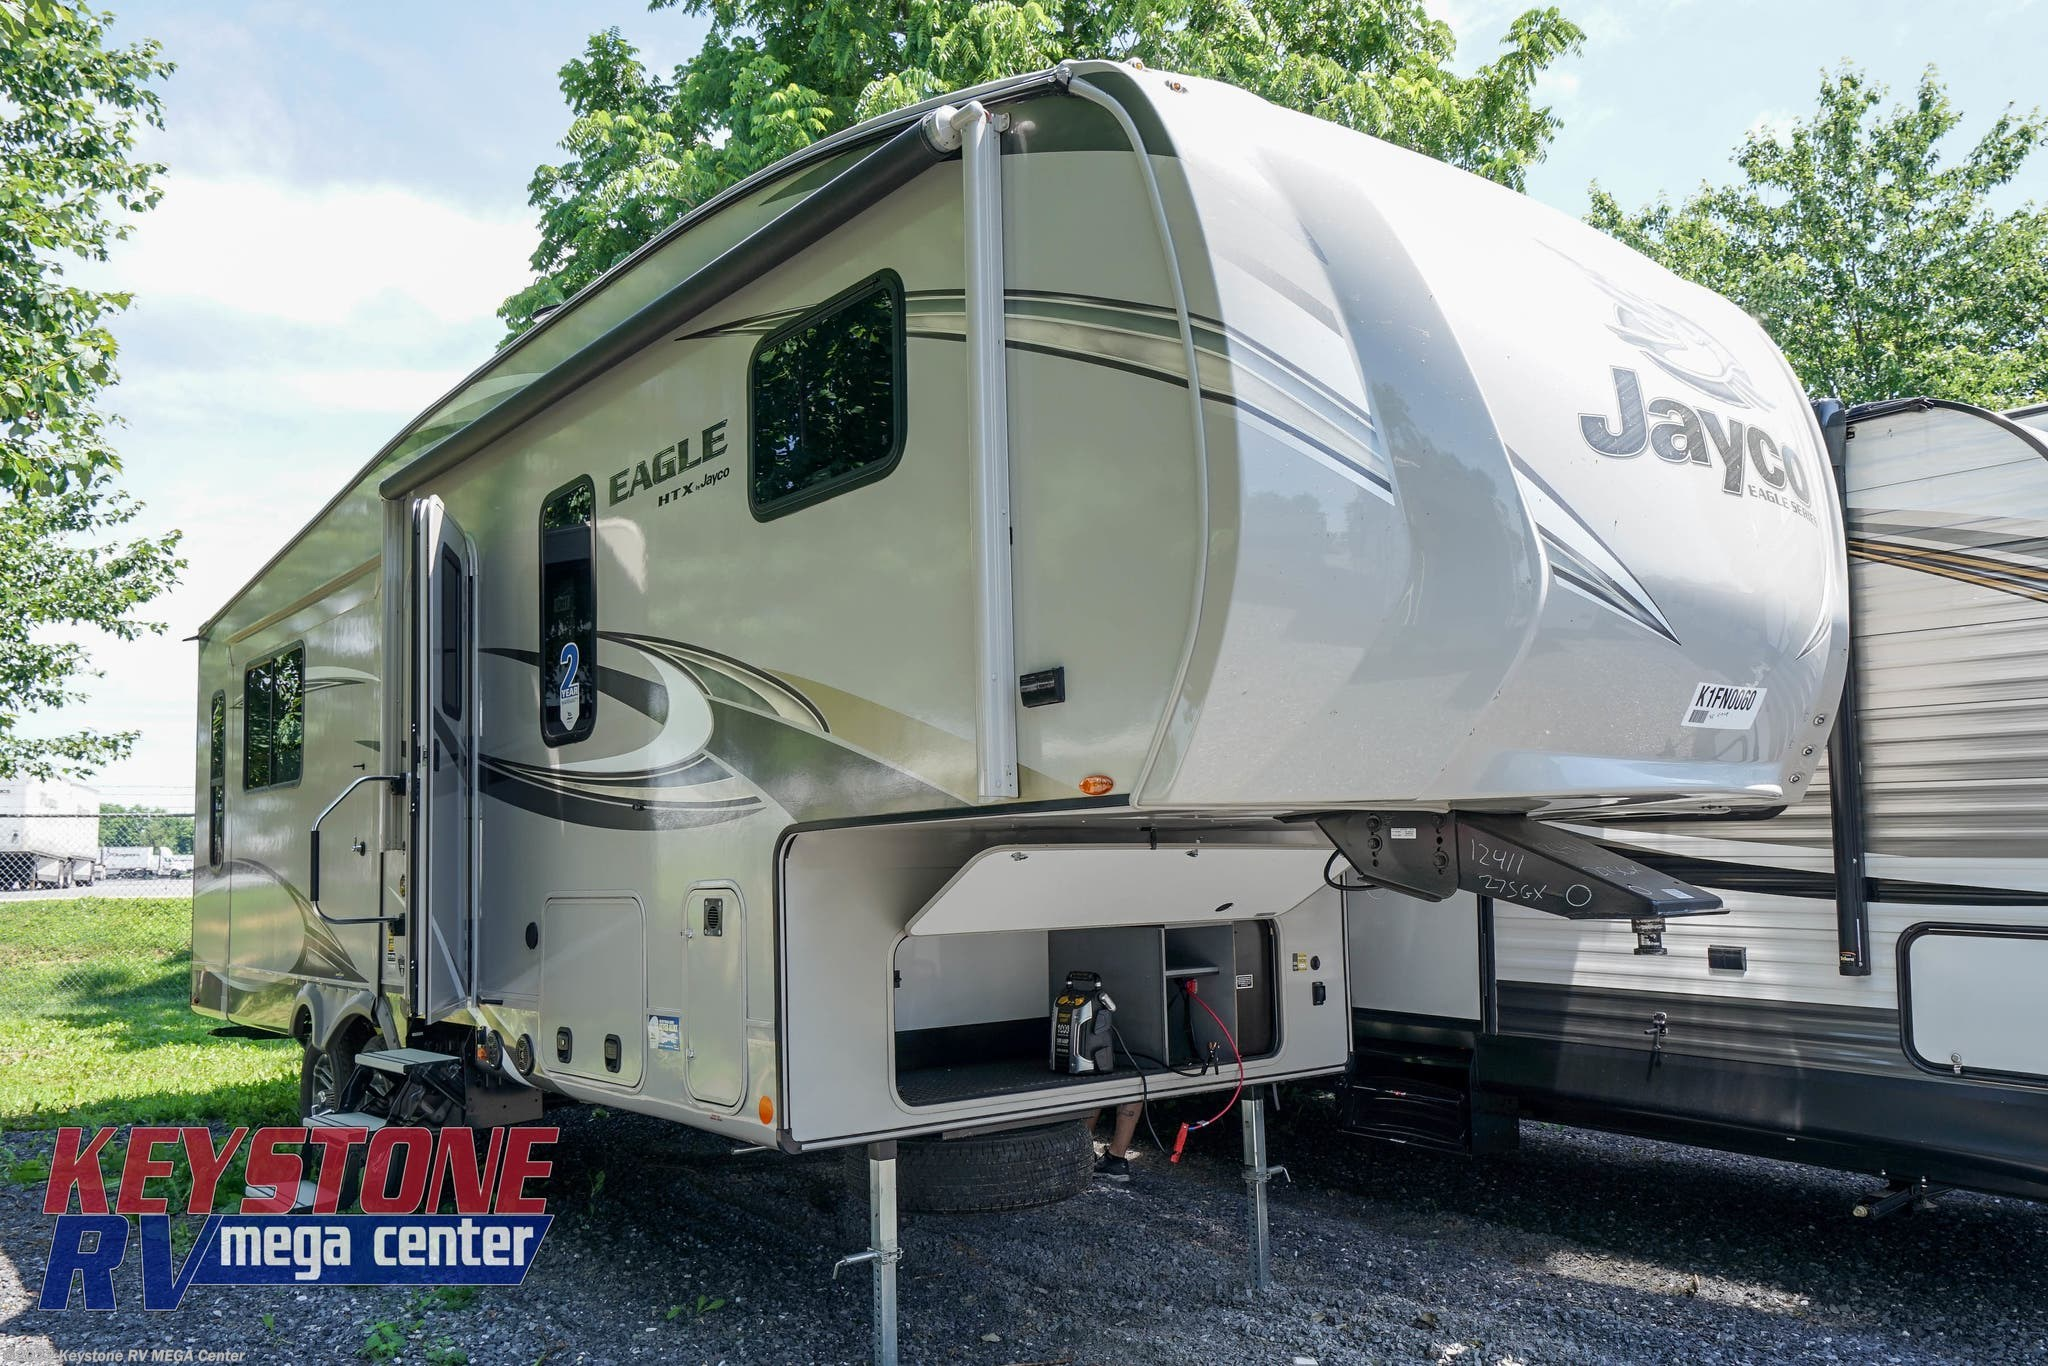 12413 - 2019 Jayco EagleHTX 27SGX for sale in Greencastle PA